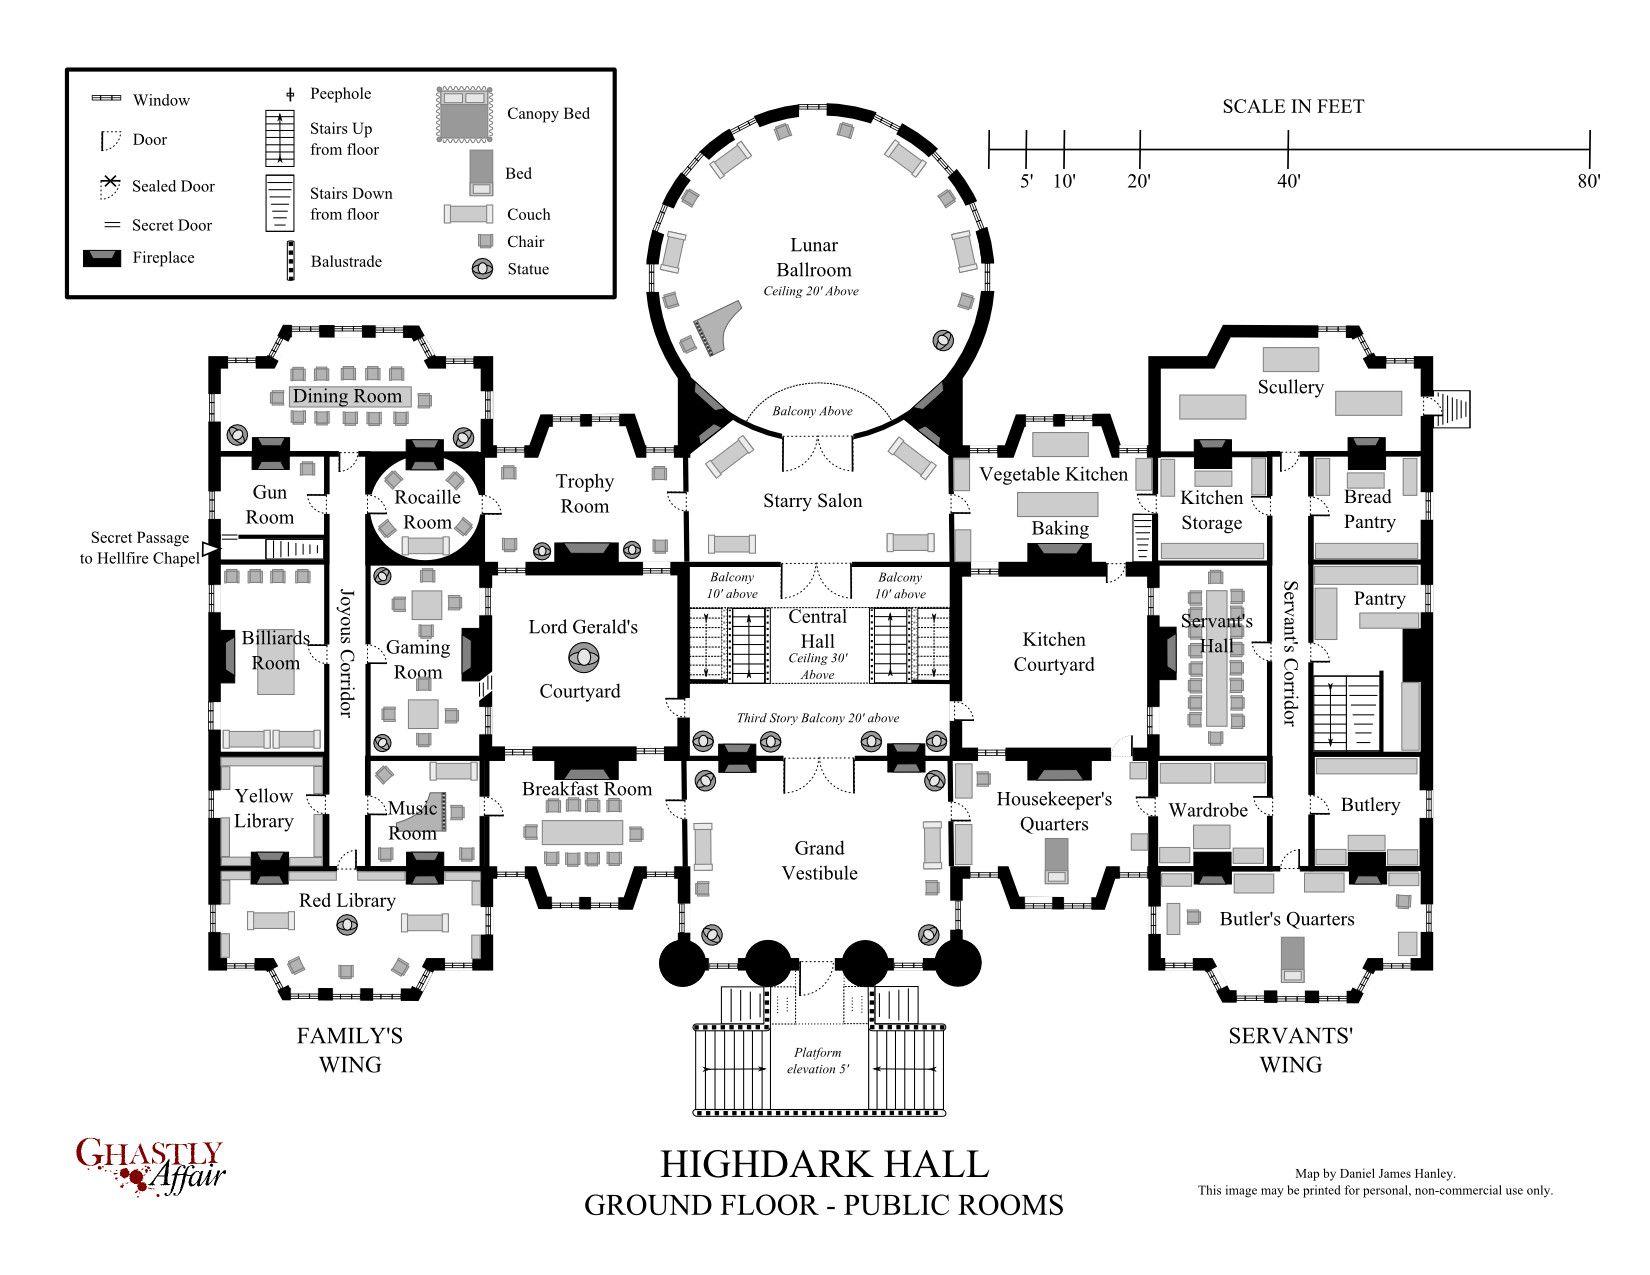 highdark hall ground floor jpg 1650 1275 maps and props highdark hall ground floor jpg 1650 1275